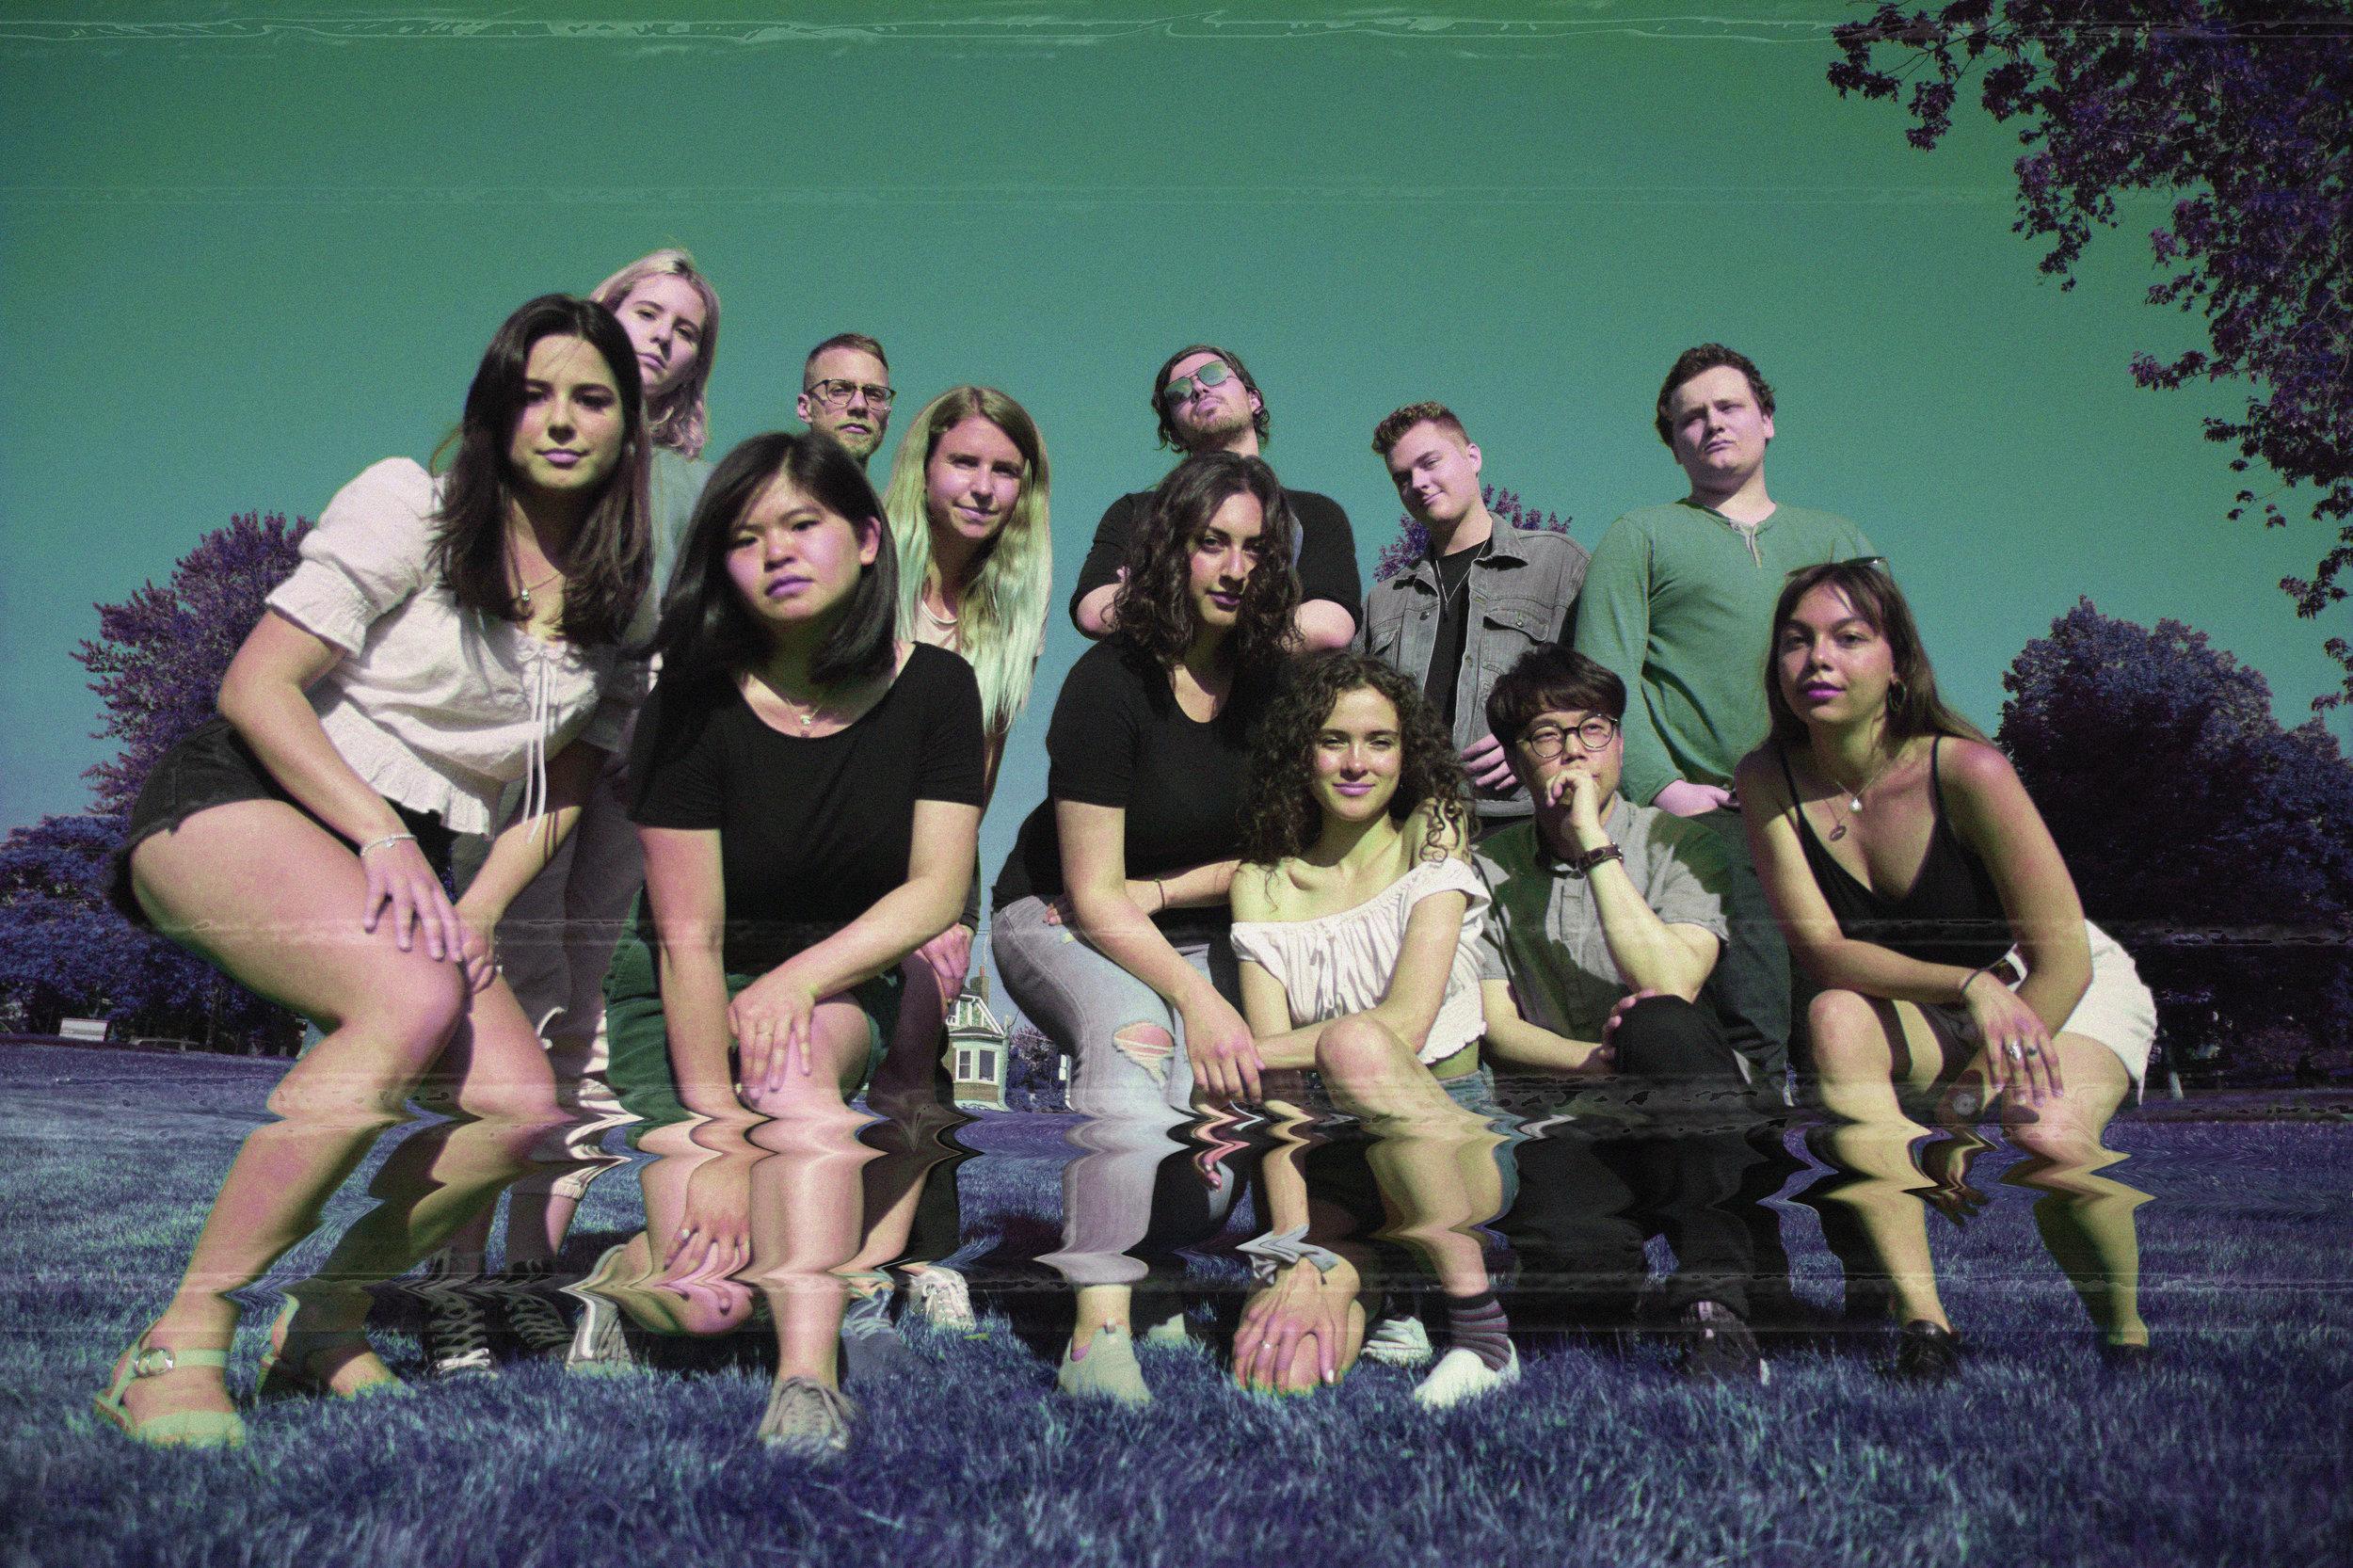 From Left to Right: Elena, Natalie, Rachel, Anthony, Miriam, Golsa, Sina, Yasmin, Nick, John, Tom, Julia